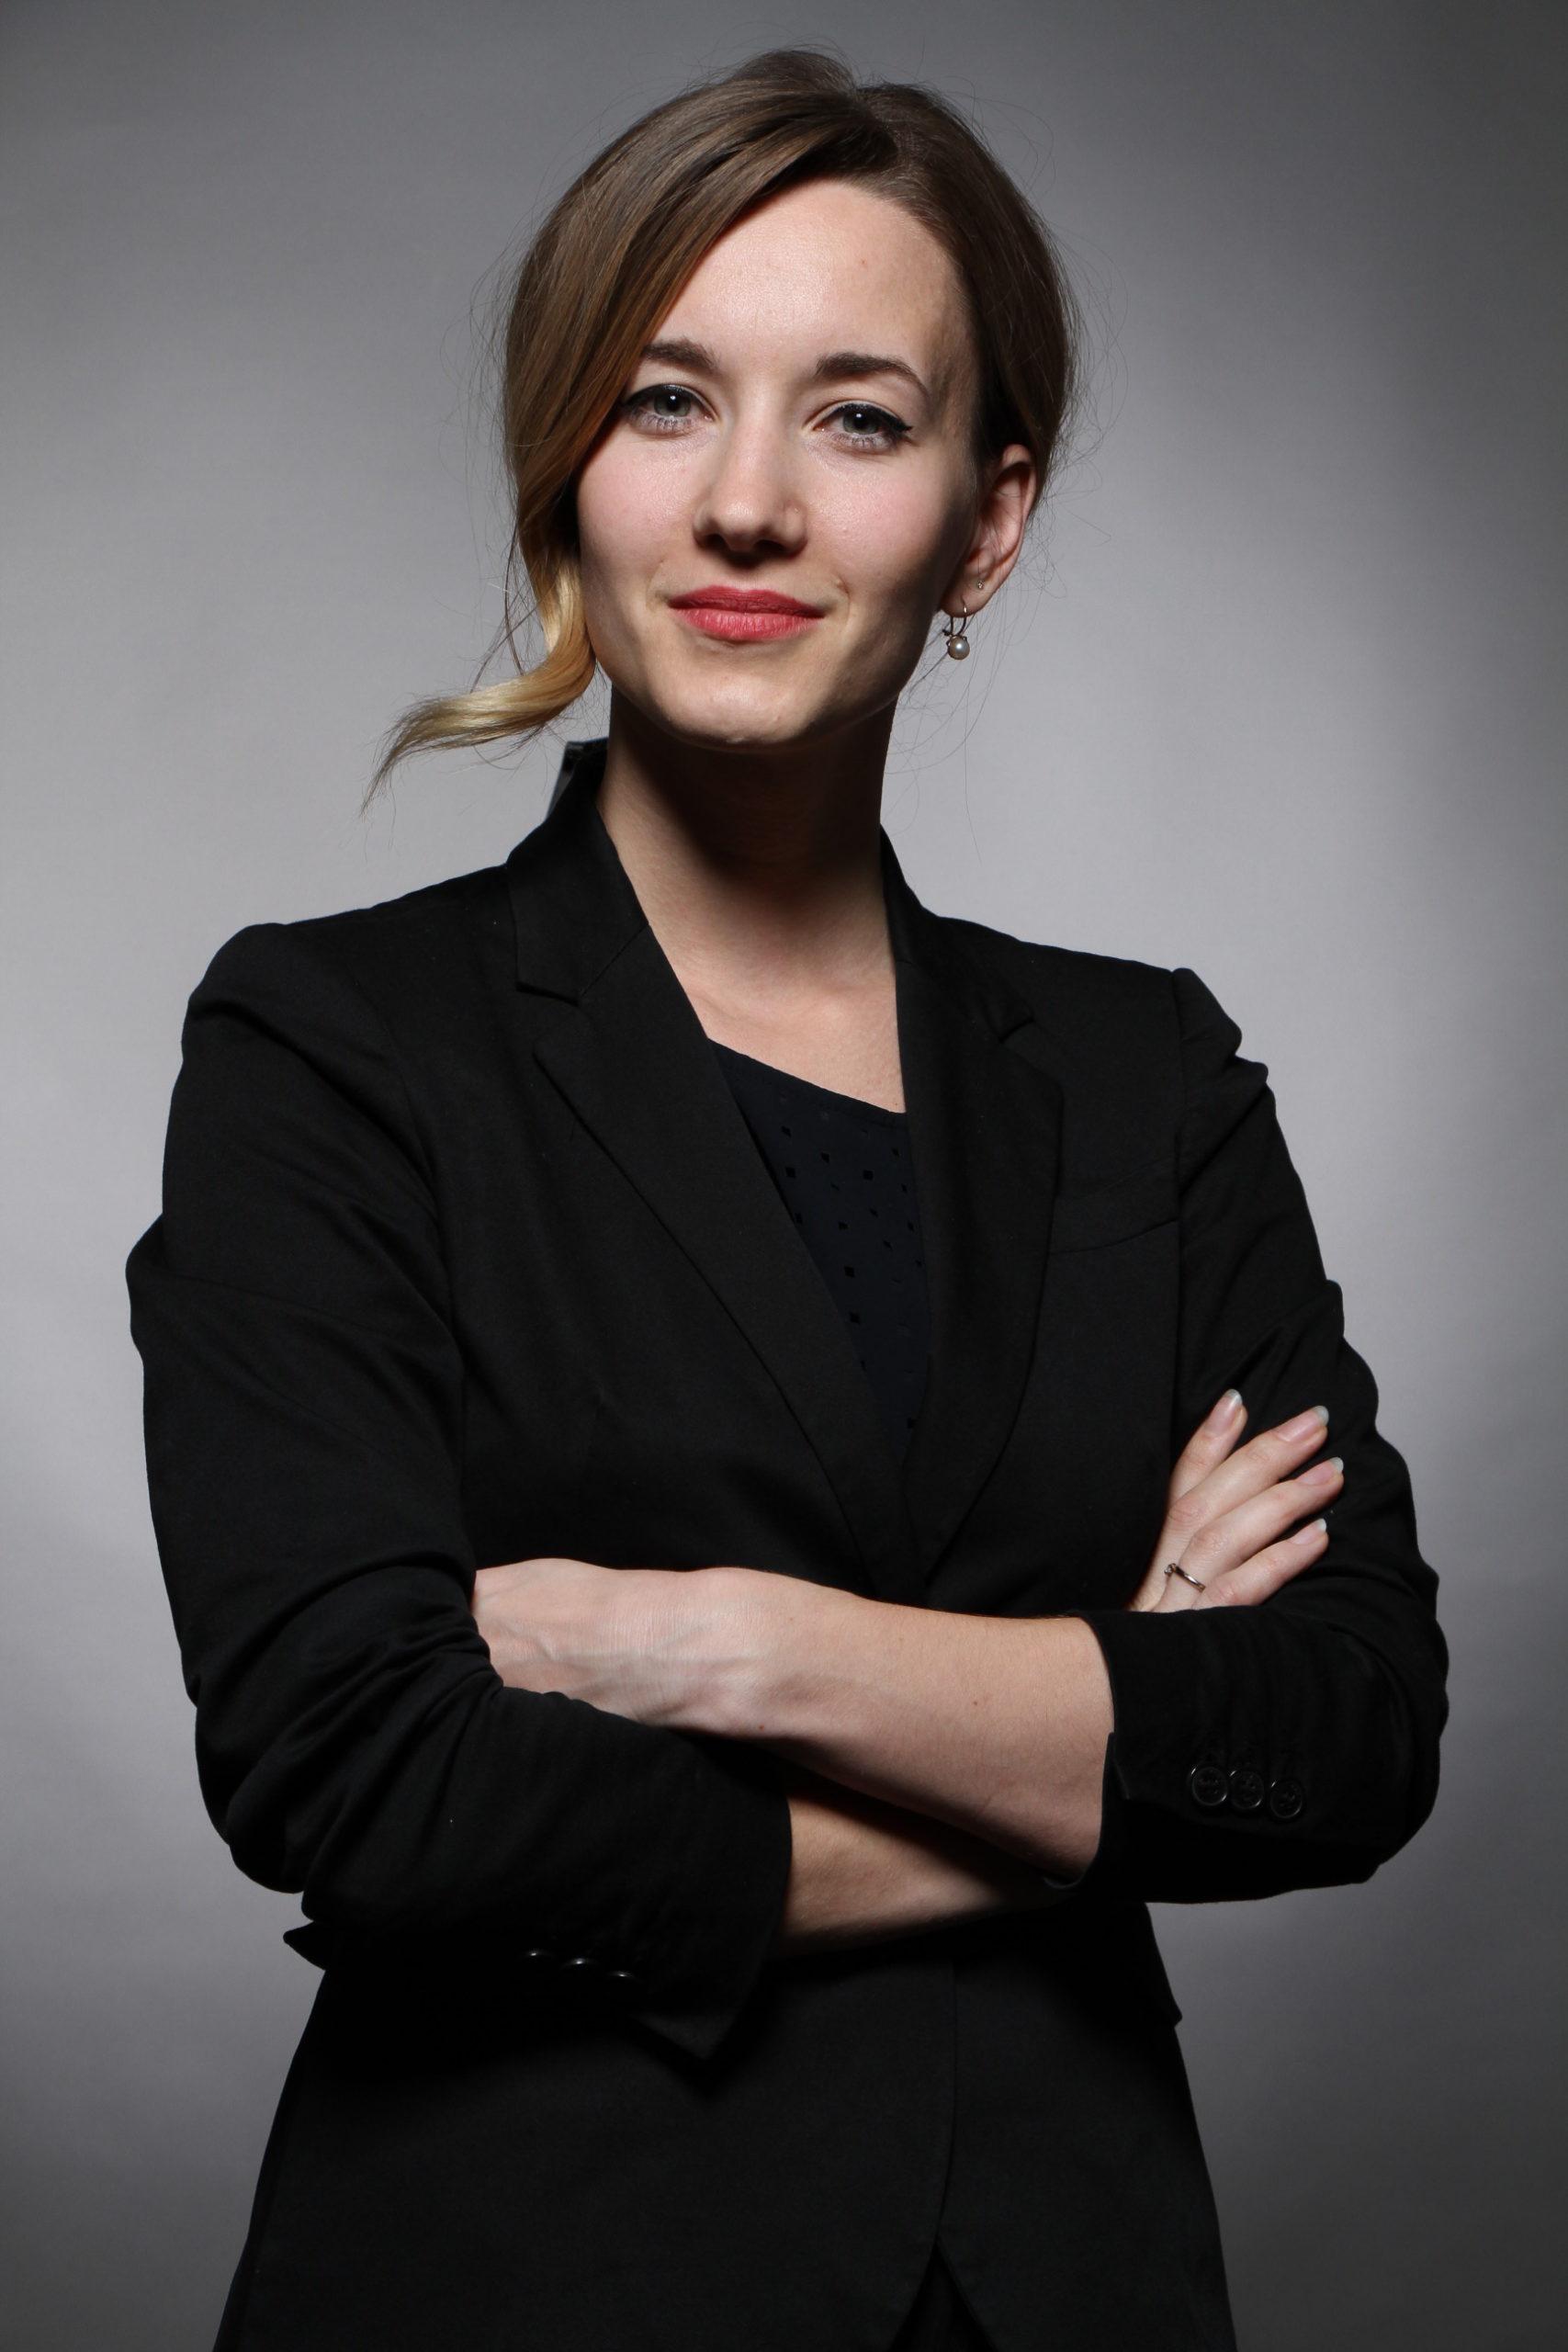 Zoia Stankovska